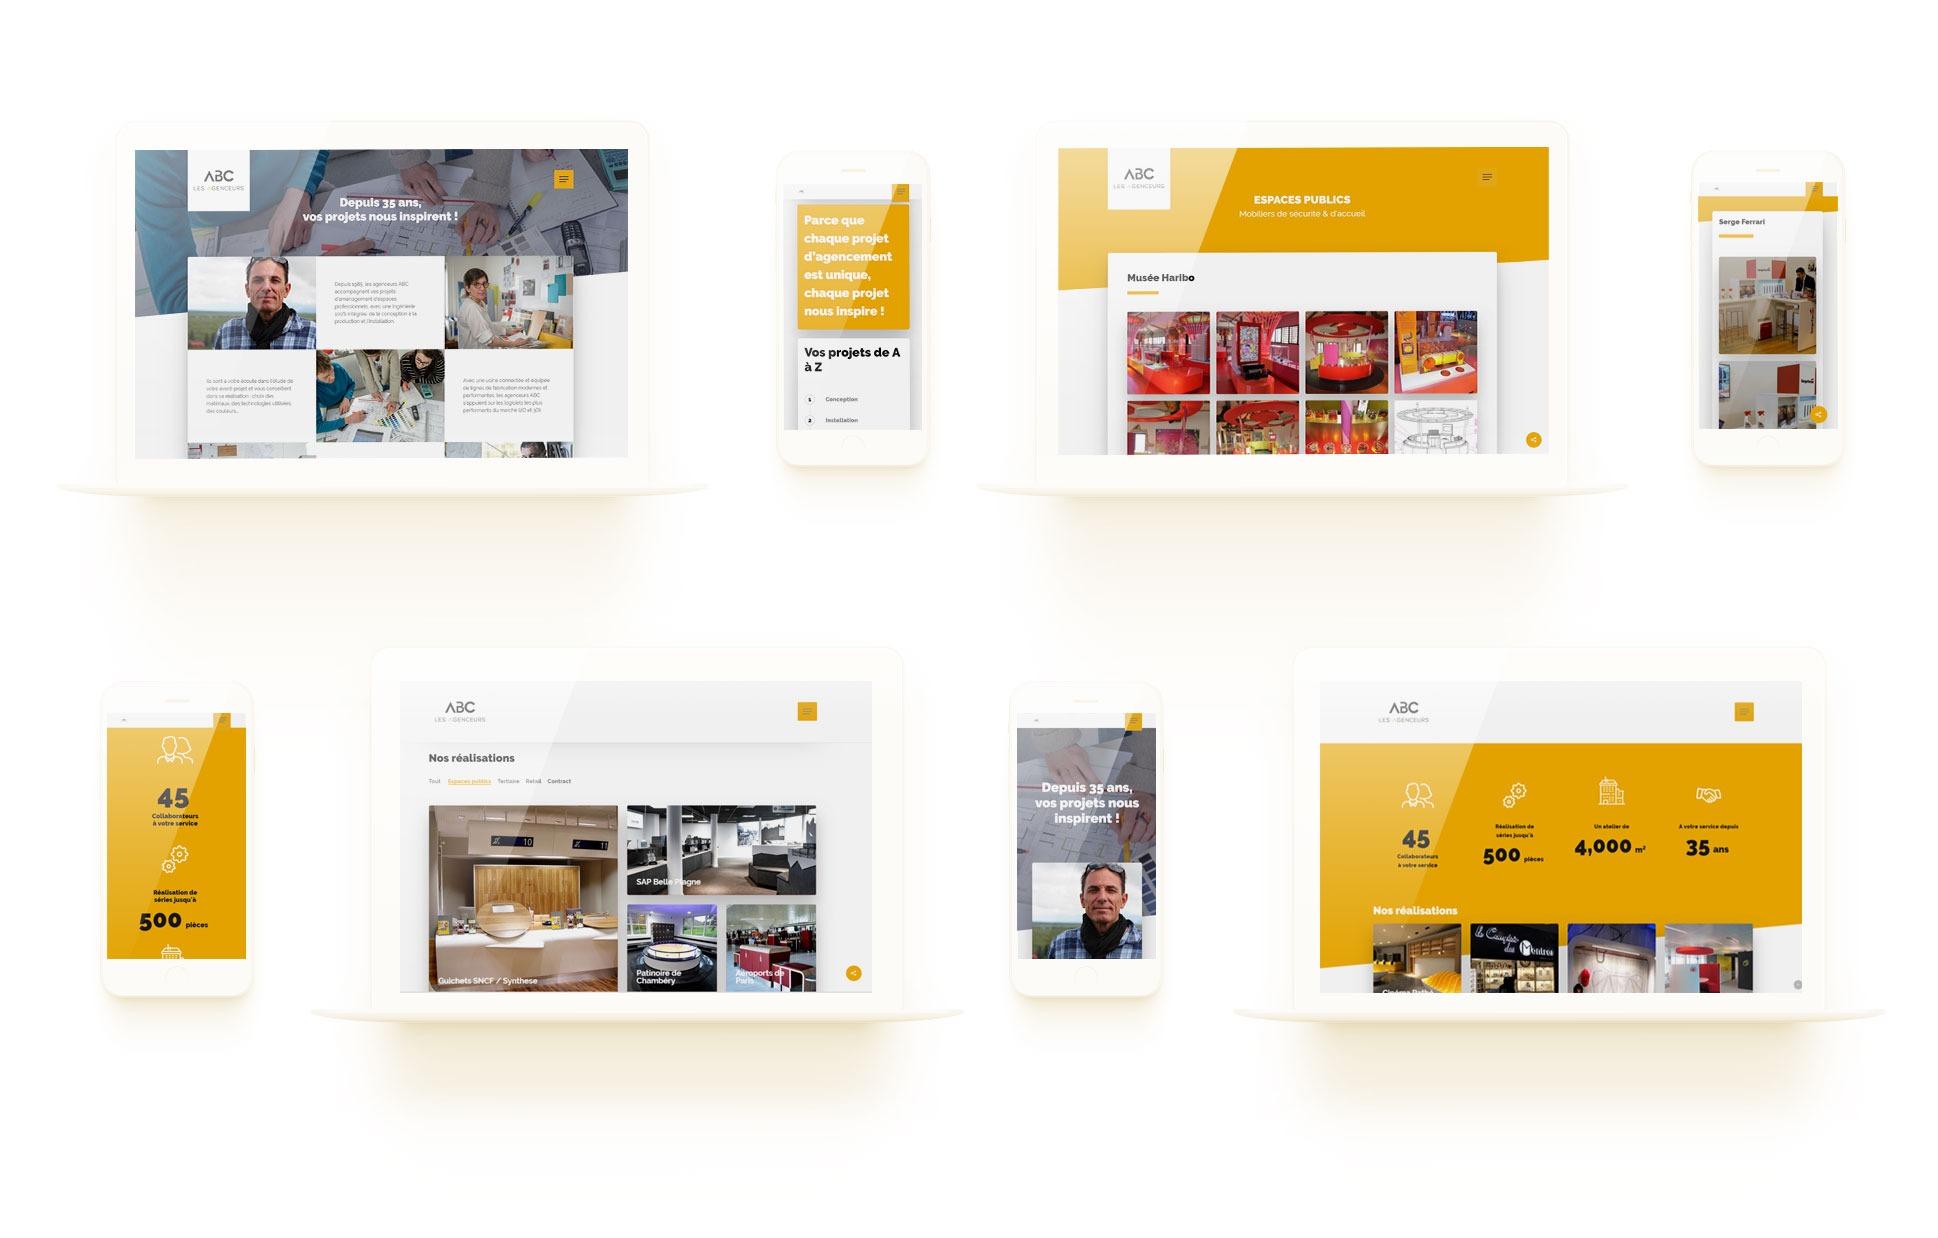 ABC Agencement responsive wordpress agence web design lyon graphisme developpement application mobile illustrations logo ecommerce boutique en ligne